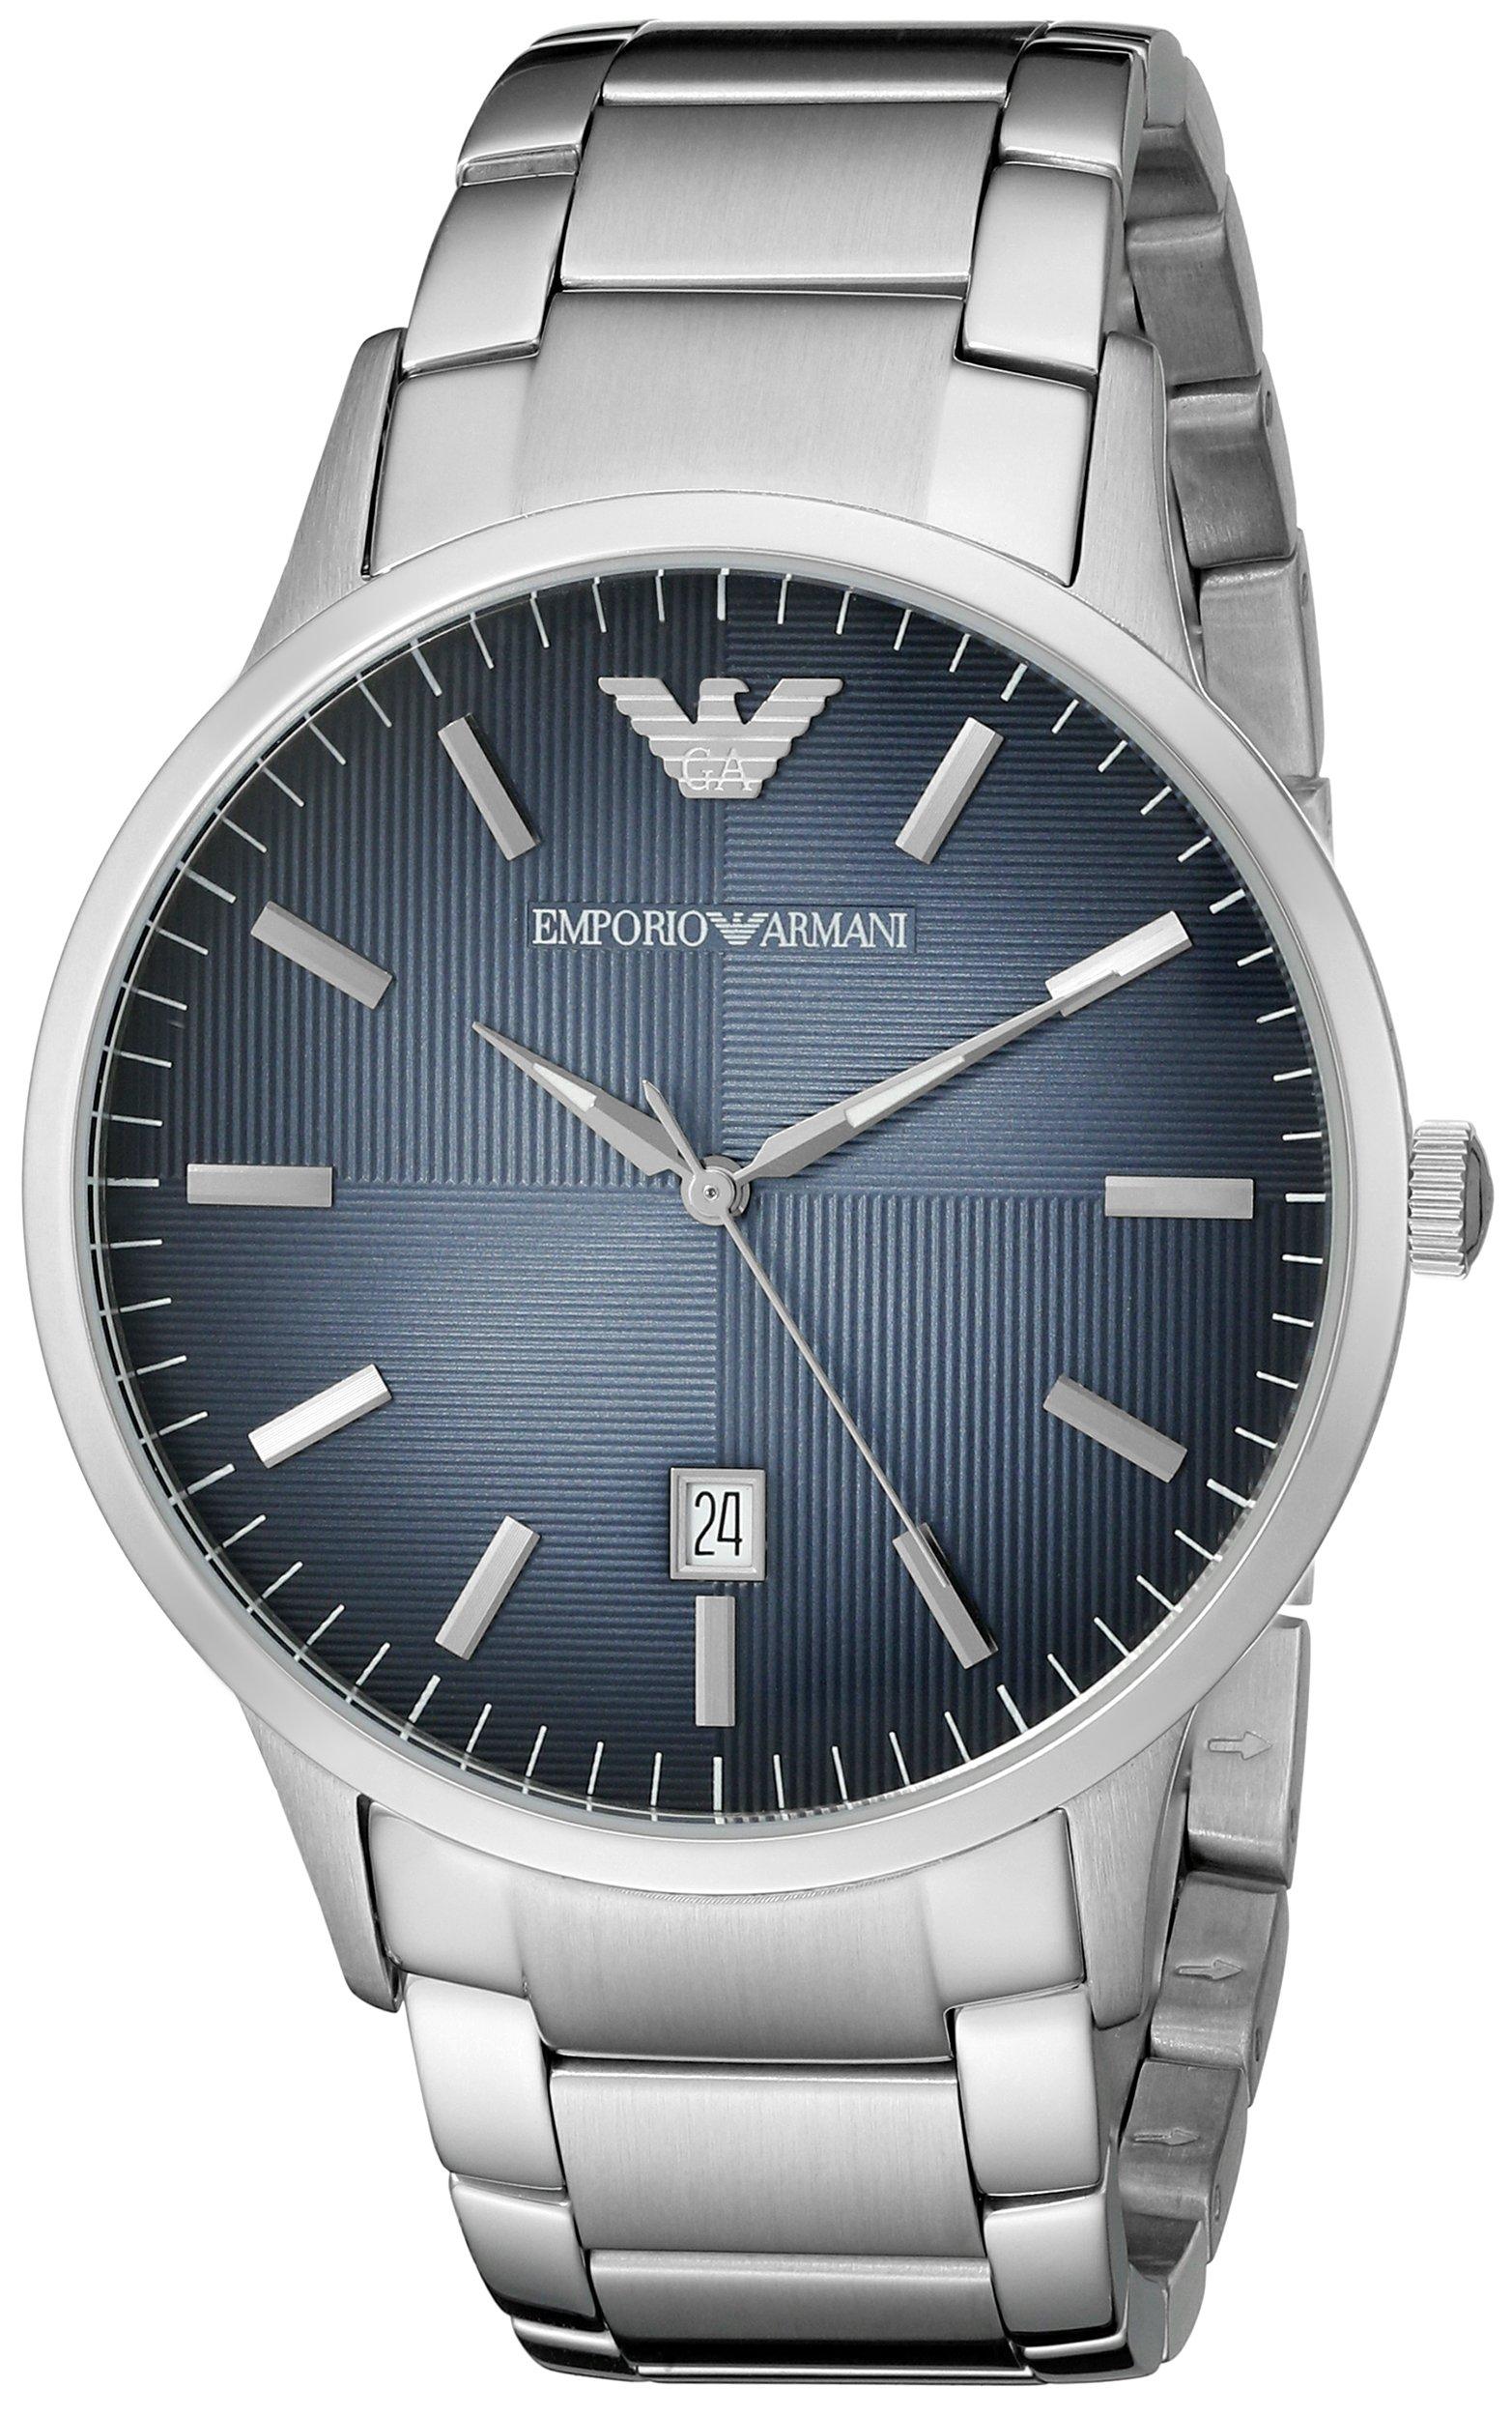 Reloj Emporio Armani para Hombre AR2472